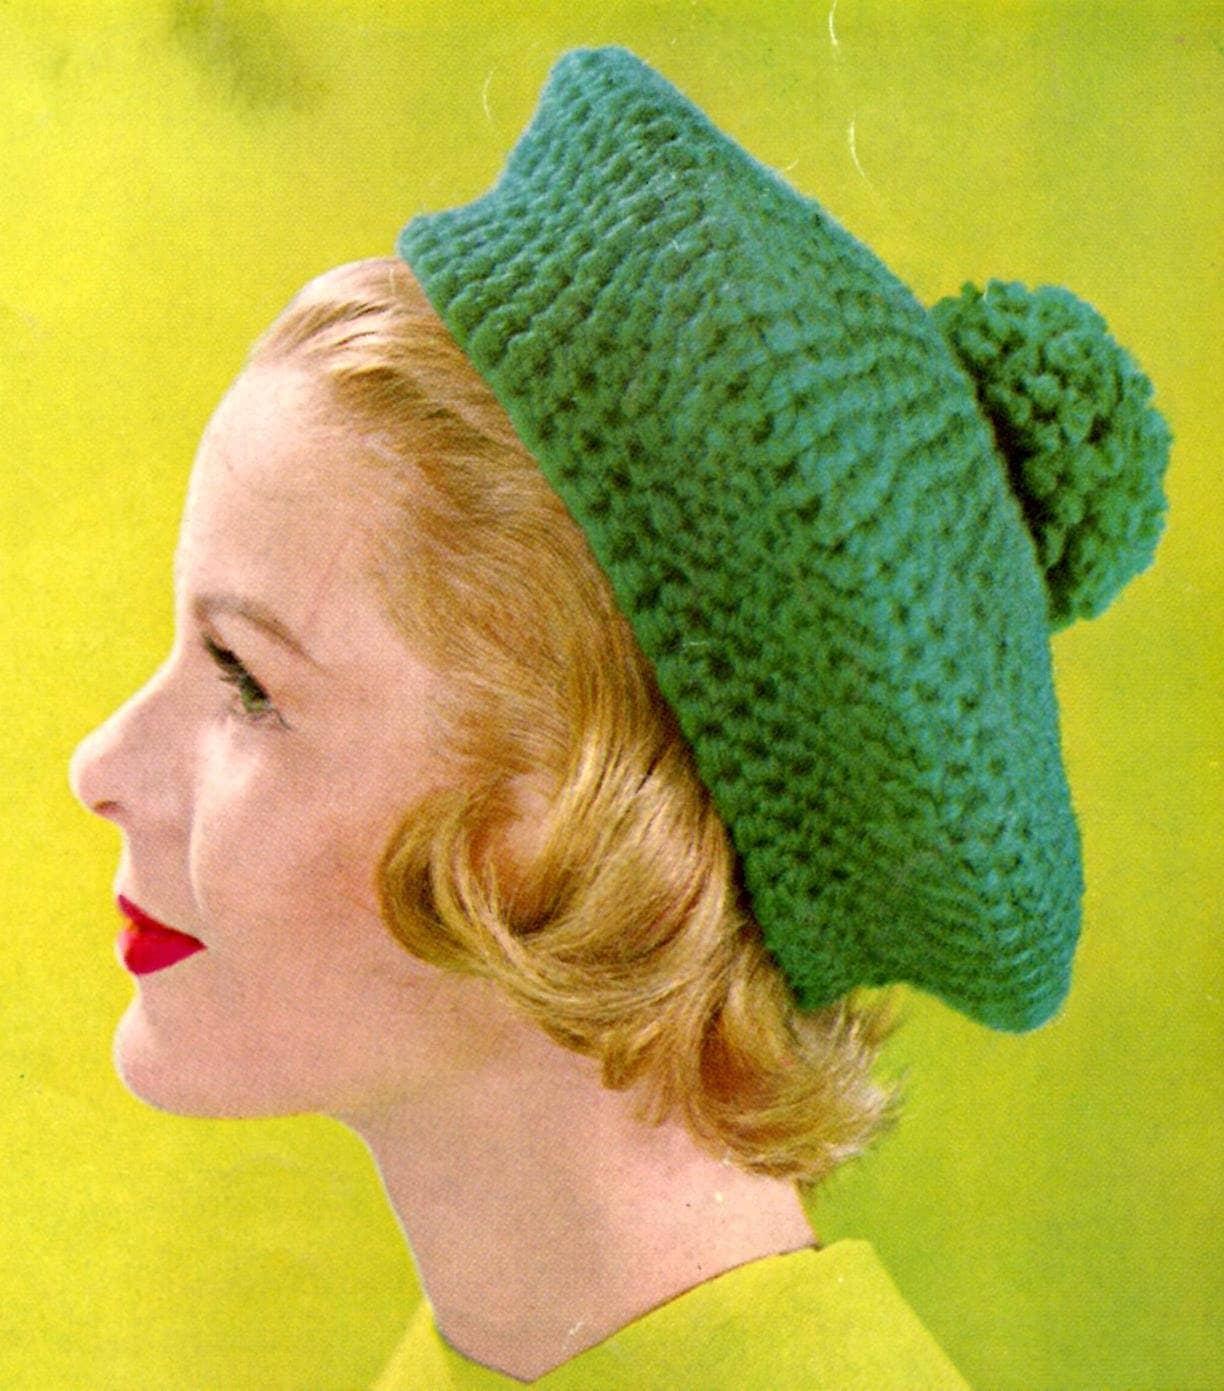 Crochet Beret Hat Pattern Easy : Easy Vintage Crochet Hat Beret Pattern by kayscrochetpatterns